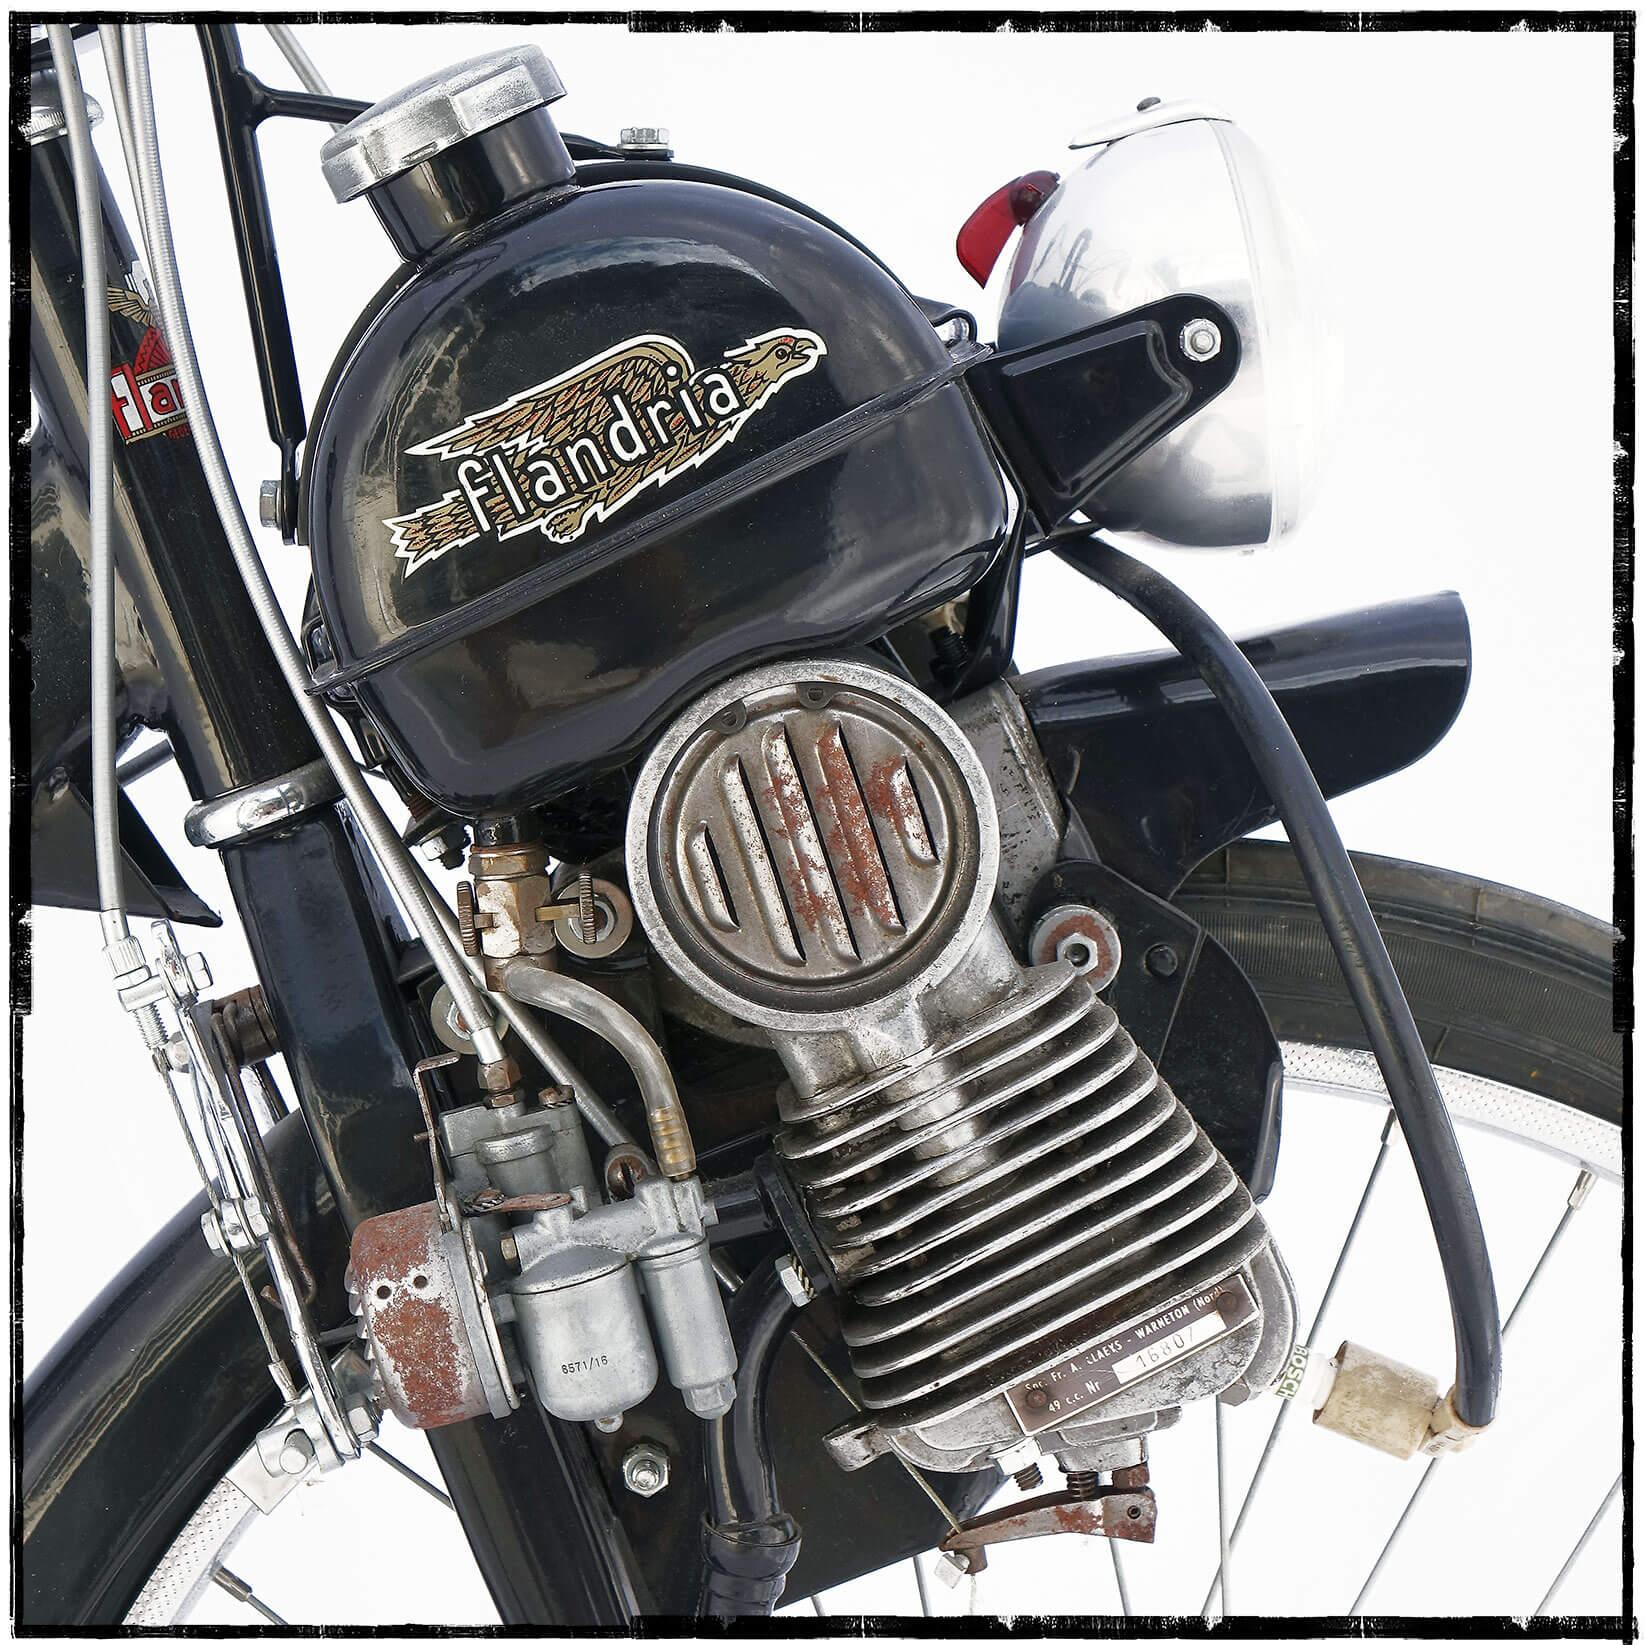 velo-a-moteur-Flandria-Veloclaeys-a-galet